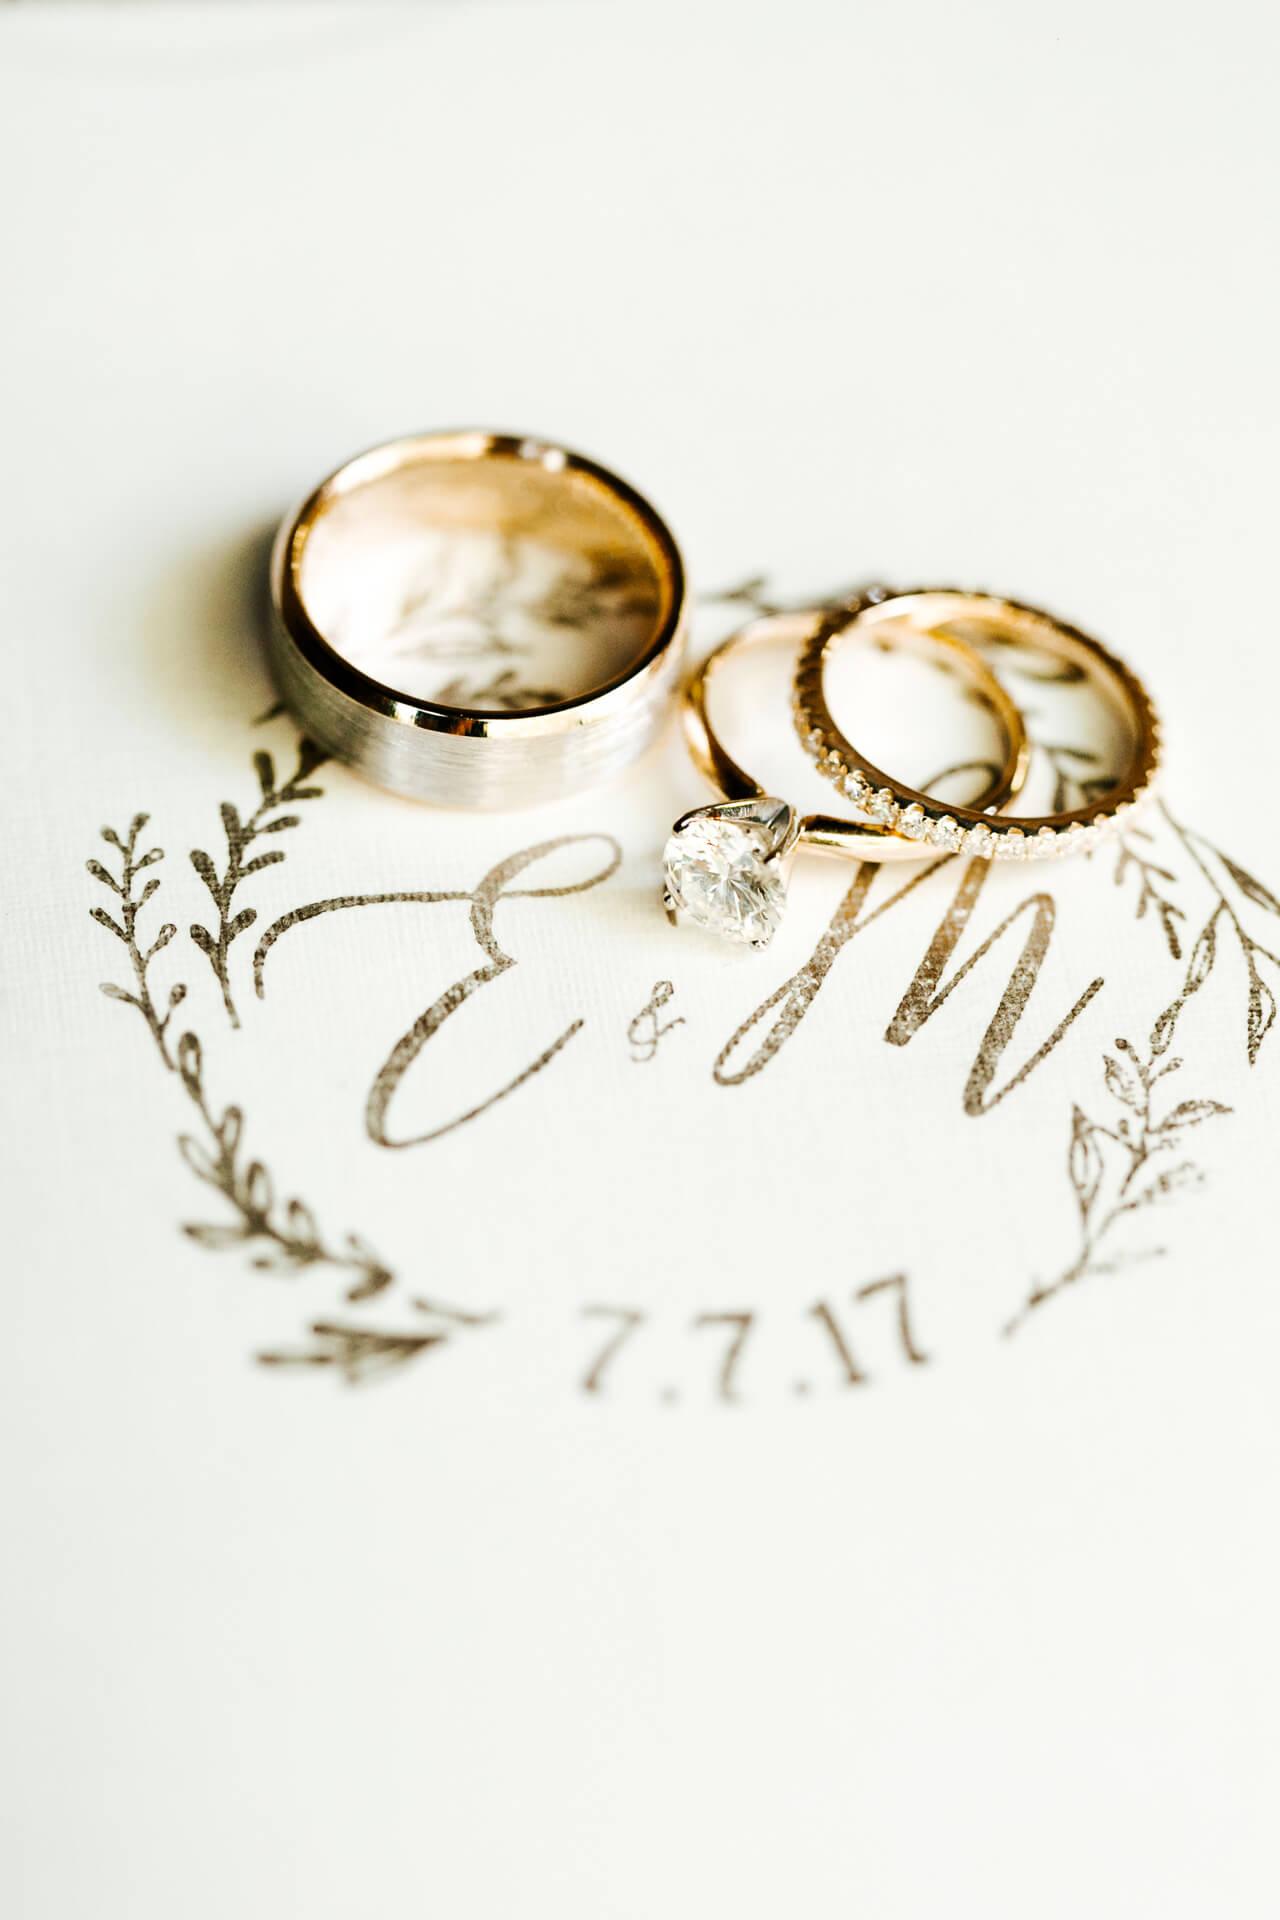 gorgeous ring shot for wedding